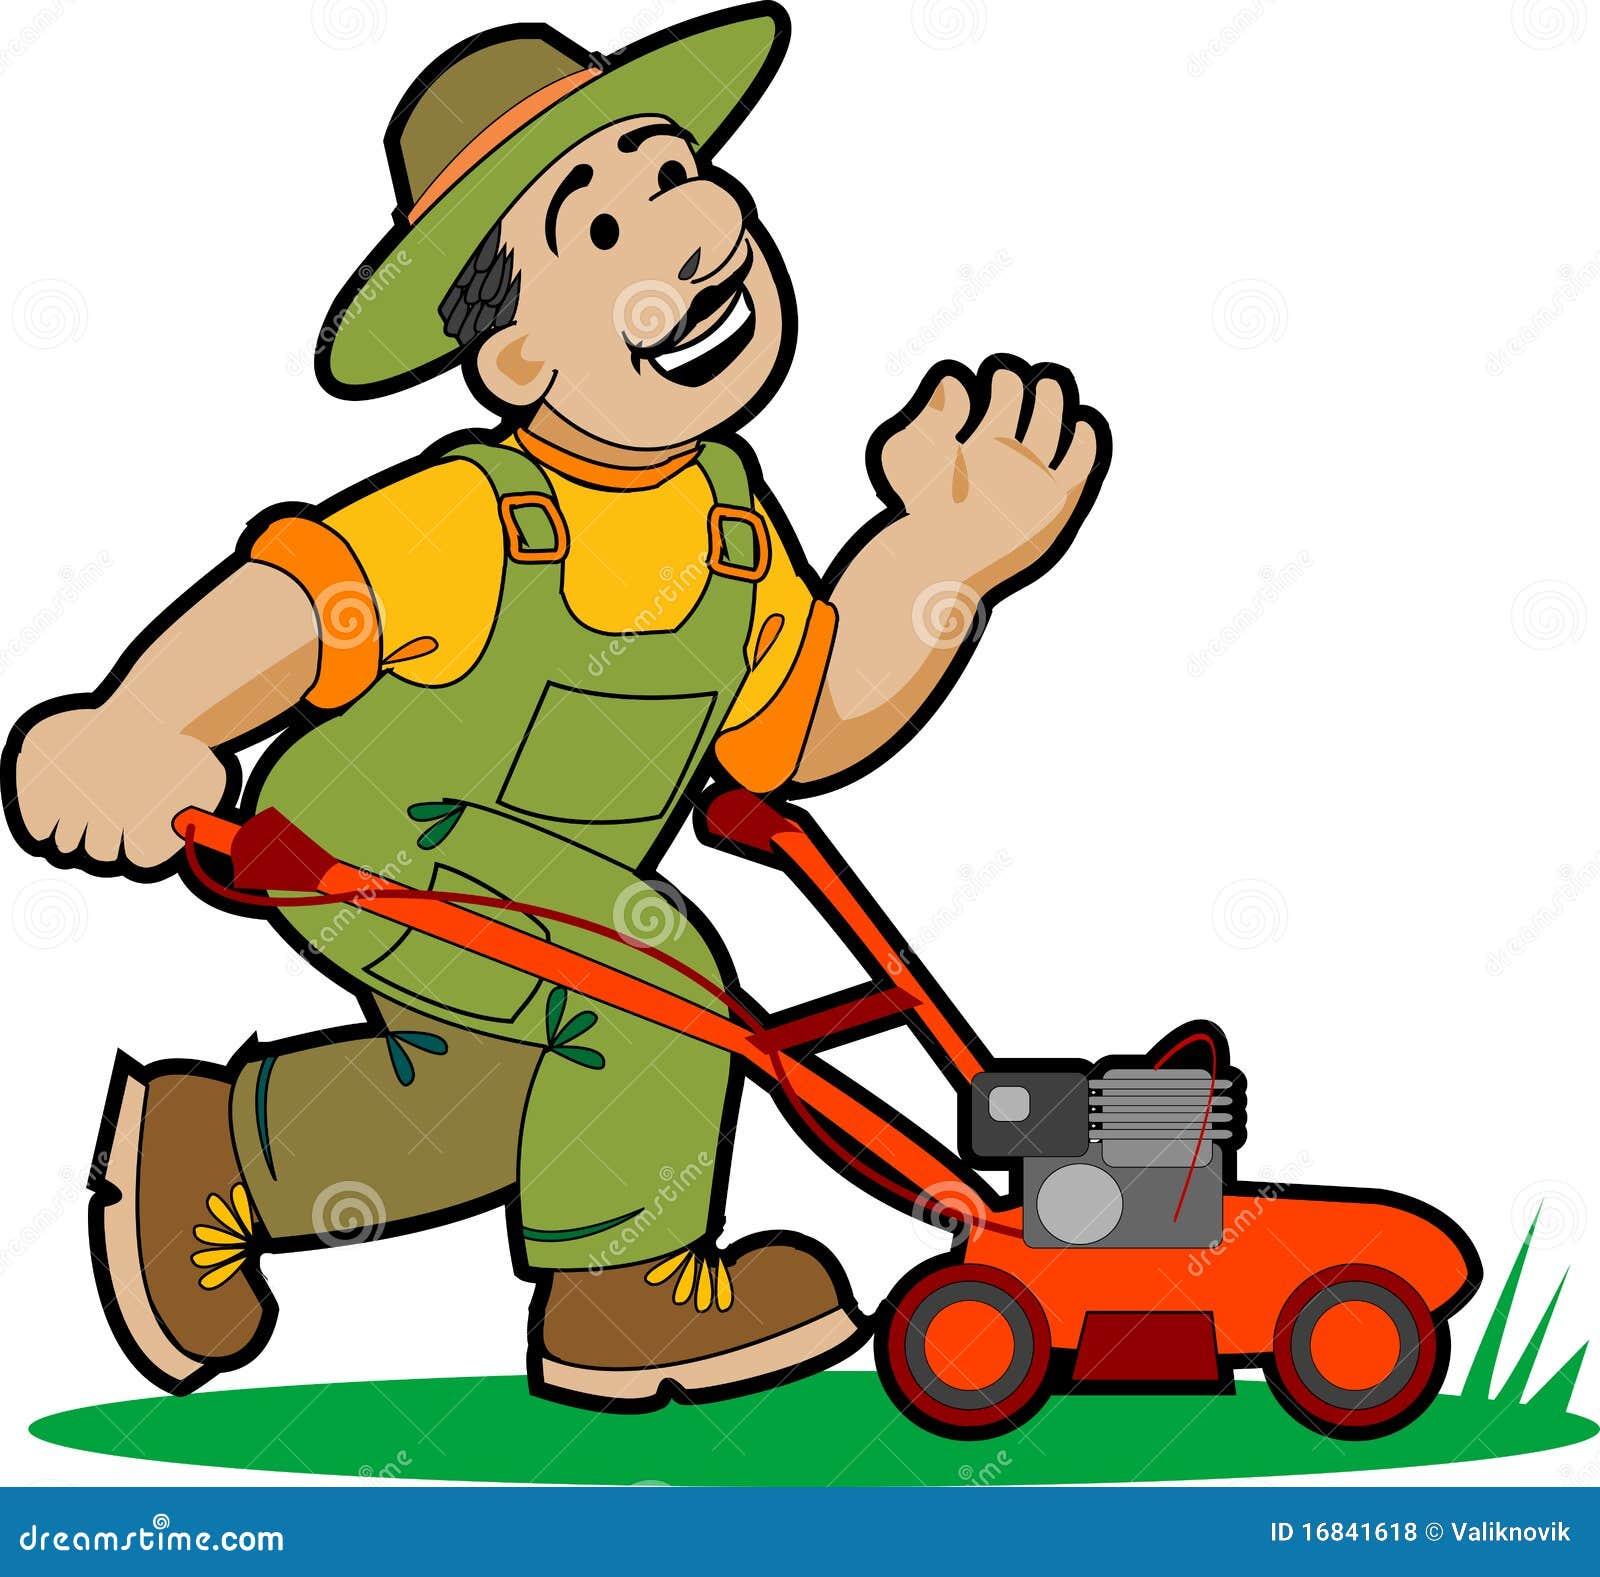 Dessin anim de jardinier illustration de vecteur for Service jardinier